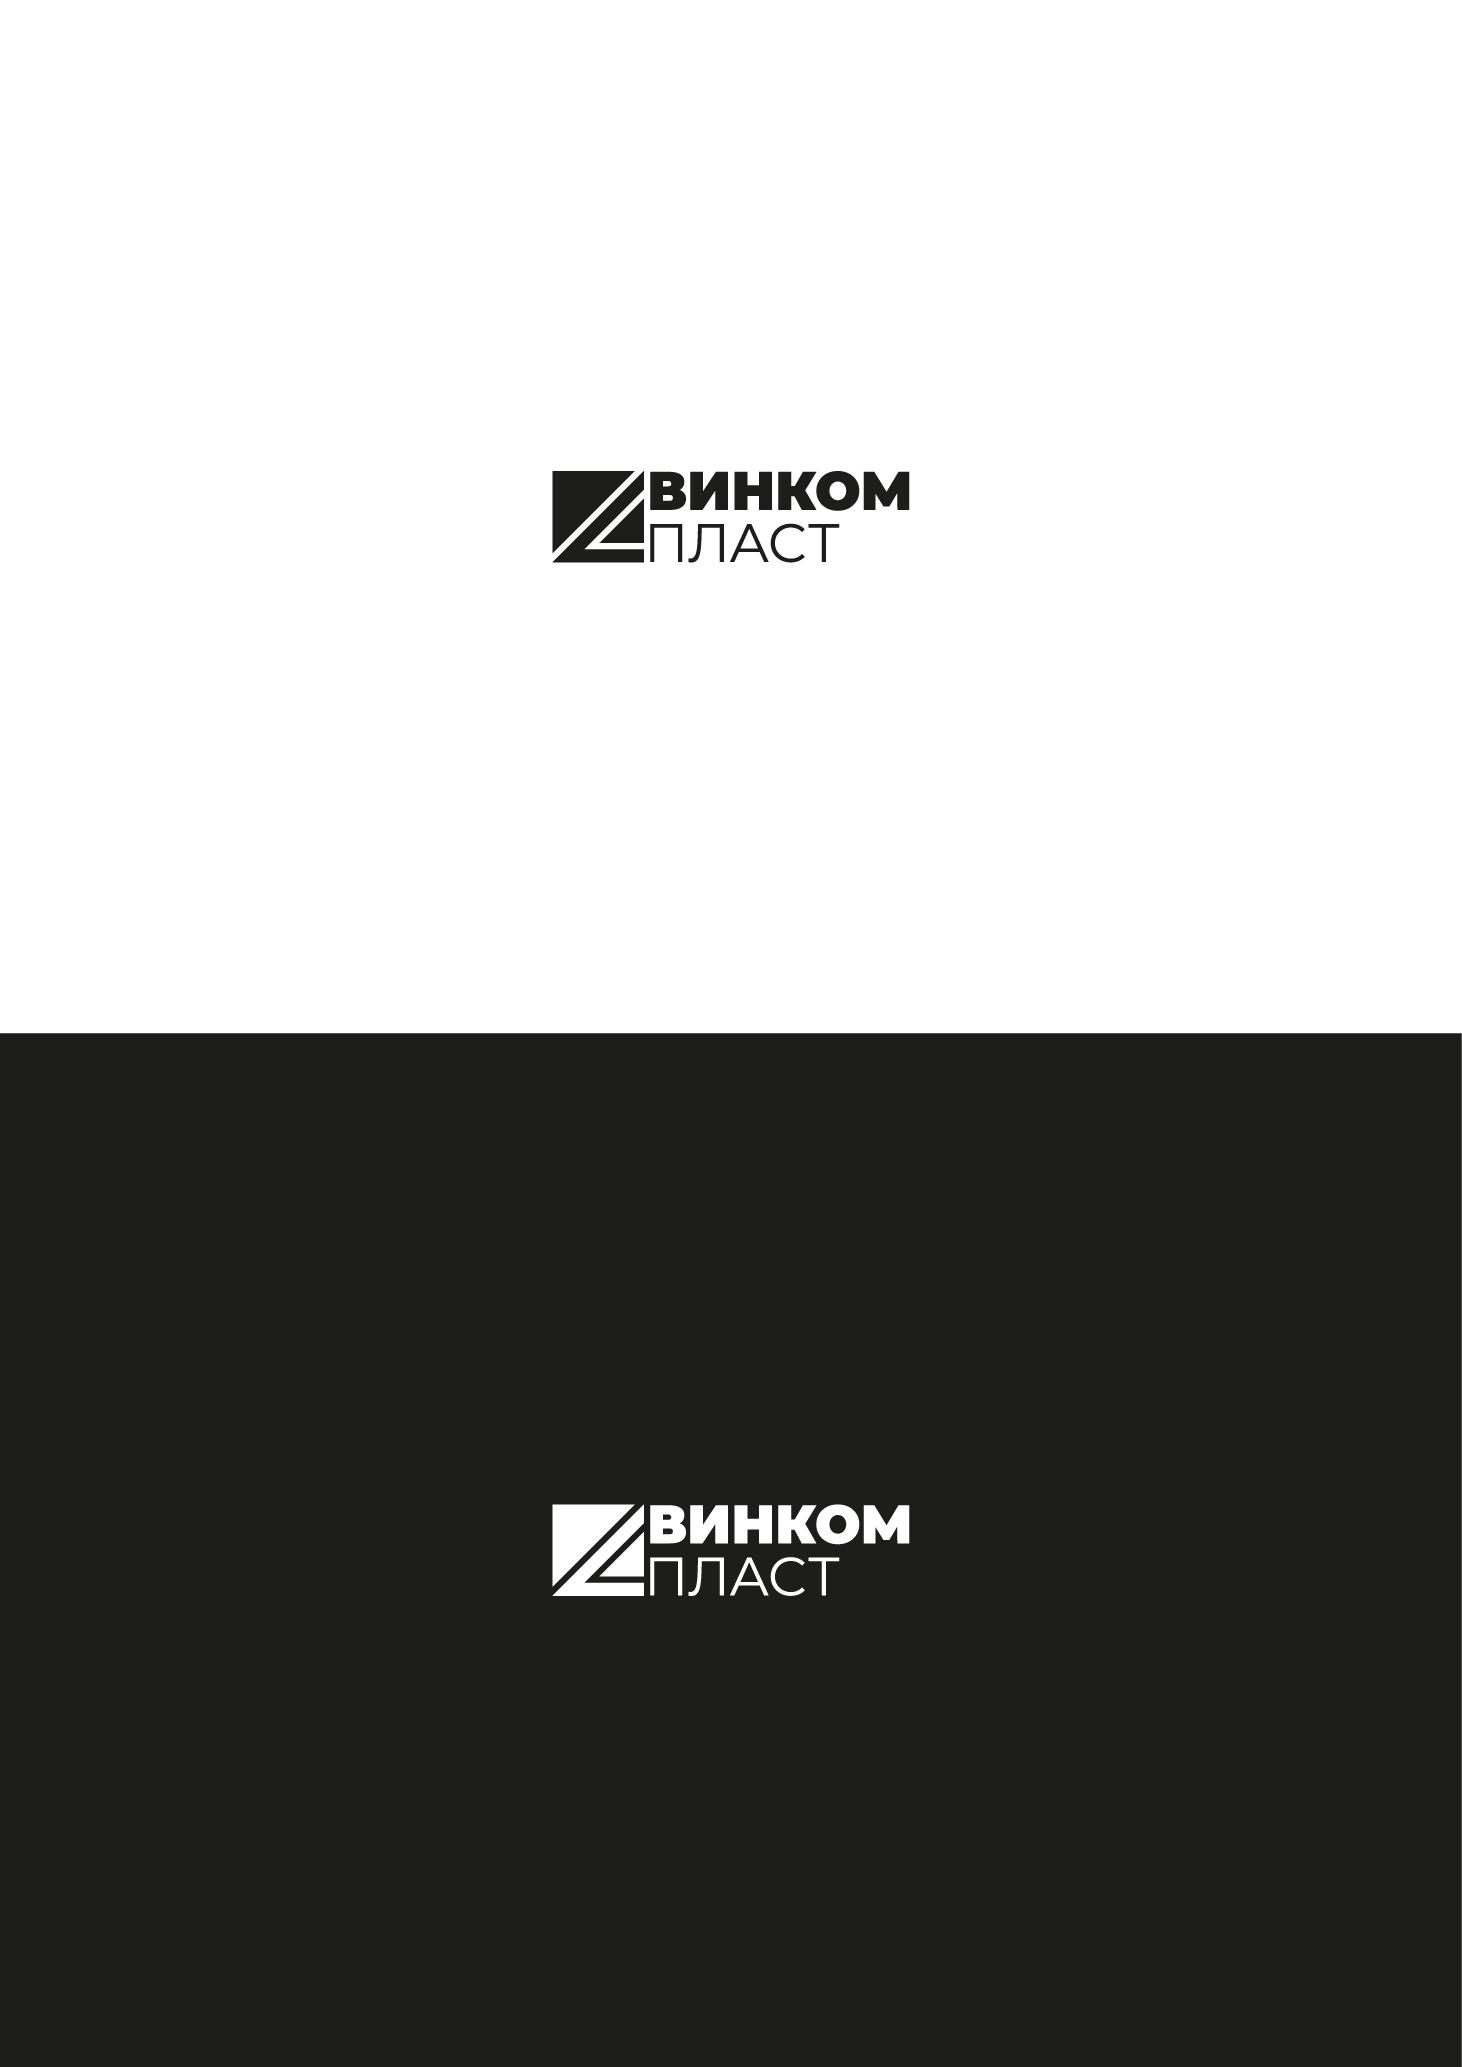 Логотип, фавикон и визитка для компании Винком Пласт  фото f_6155c37914a388bb.png